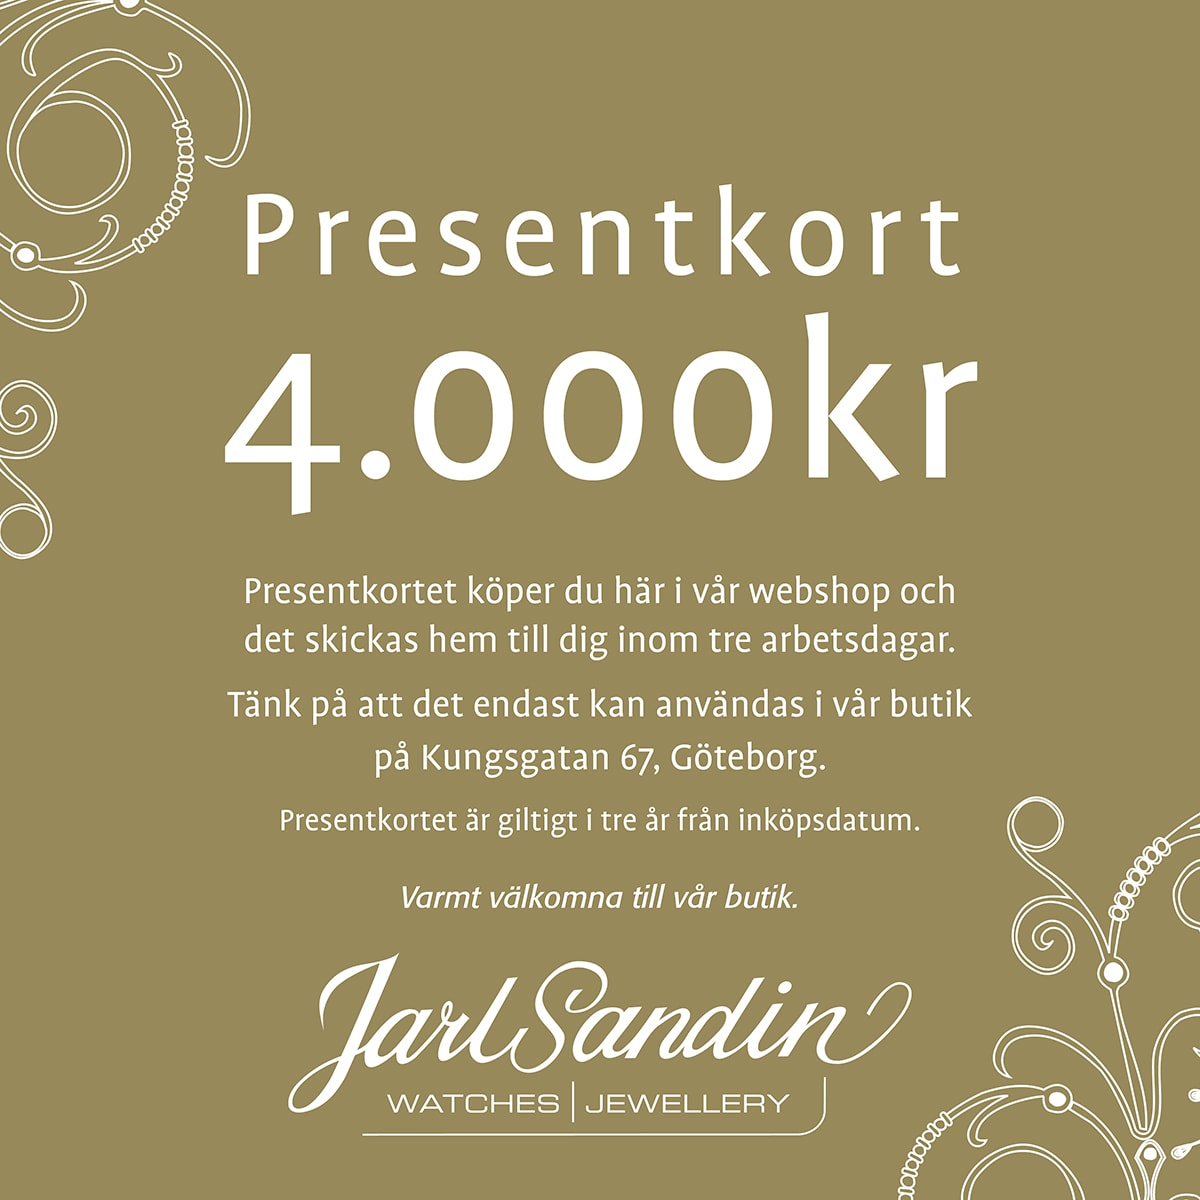 Presentkort_Jarl_Sandin_ 4000kr